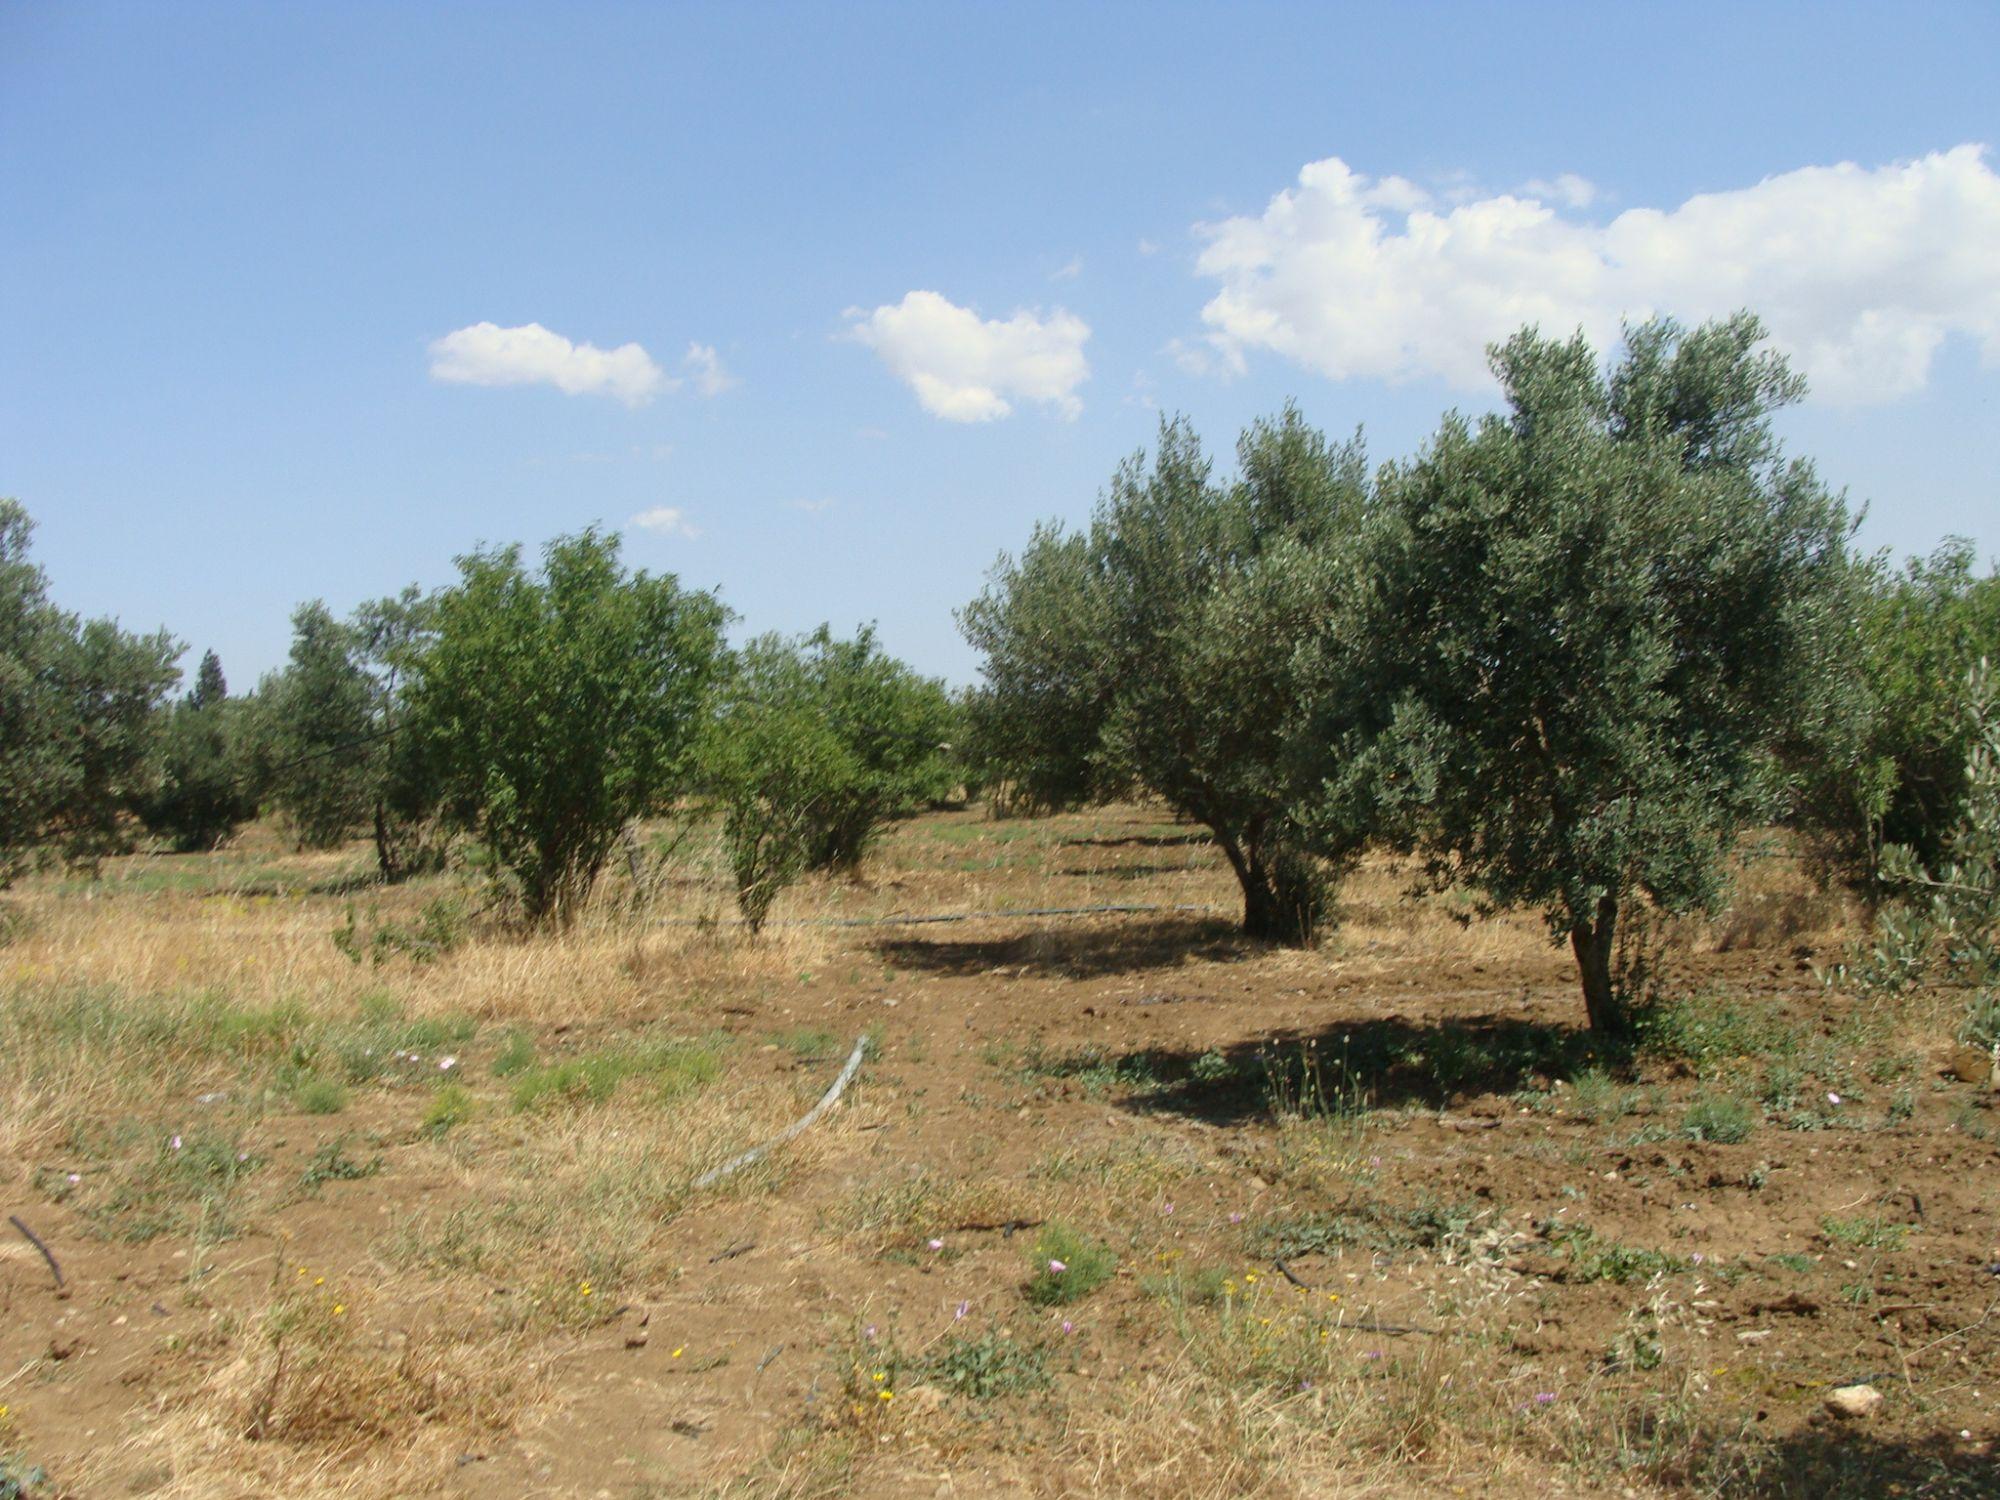 Terrain agricole mogren vente terrain el magren for Agence immobiliere zaghouan